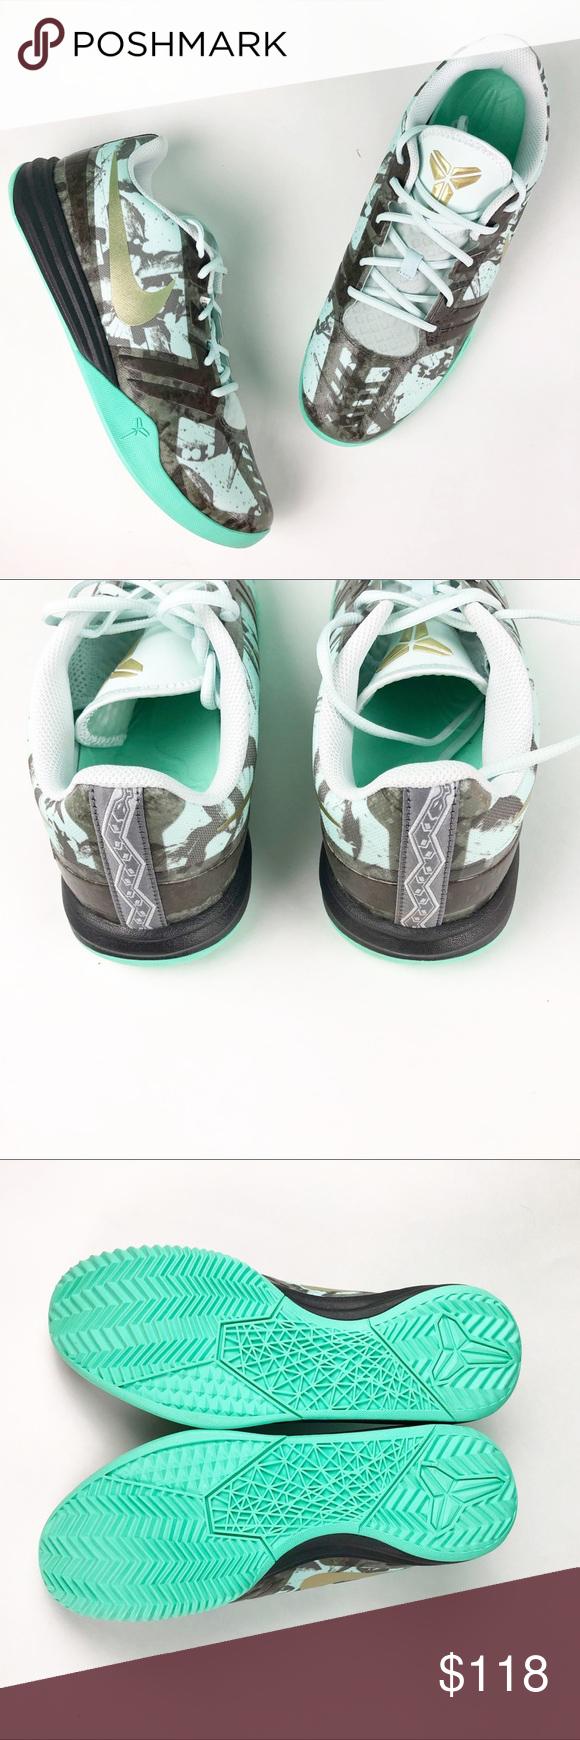 0e4cd1a83068 Nike Kobe Bryant Mentality Mint Sneakers G7 Nike KB Kobe Bryant Mentality  Fiberglass Mint Metallic Pewter